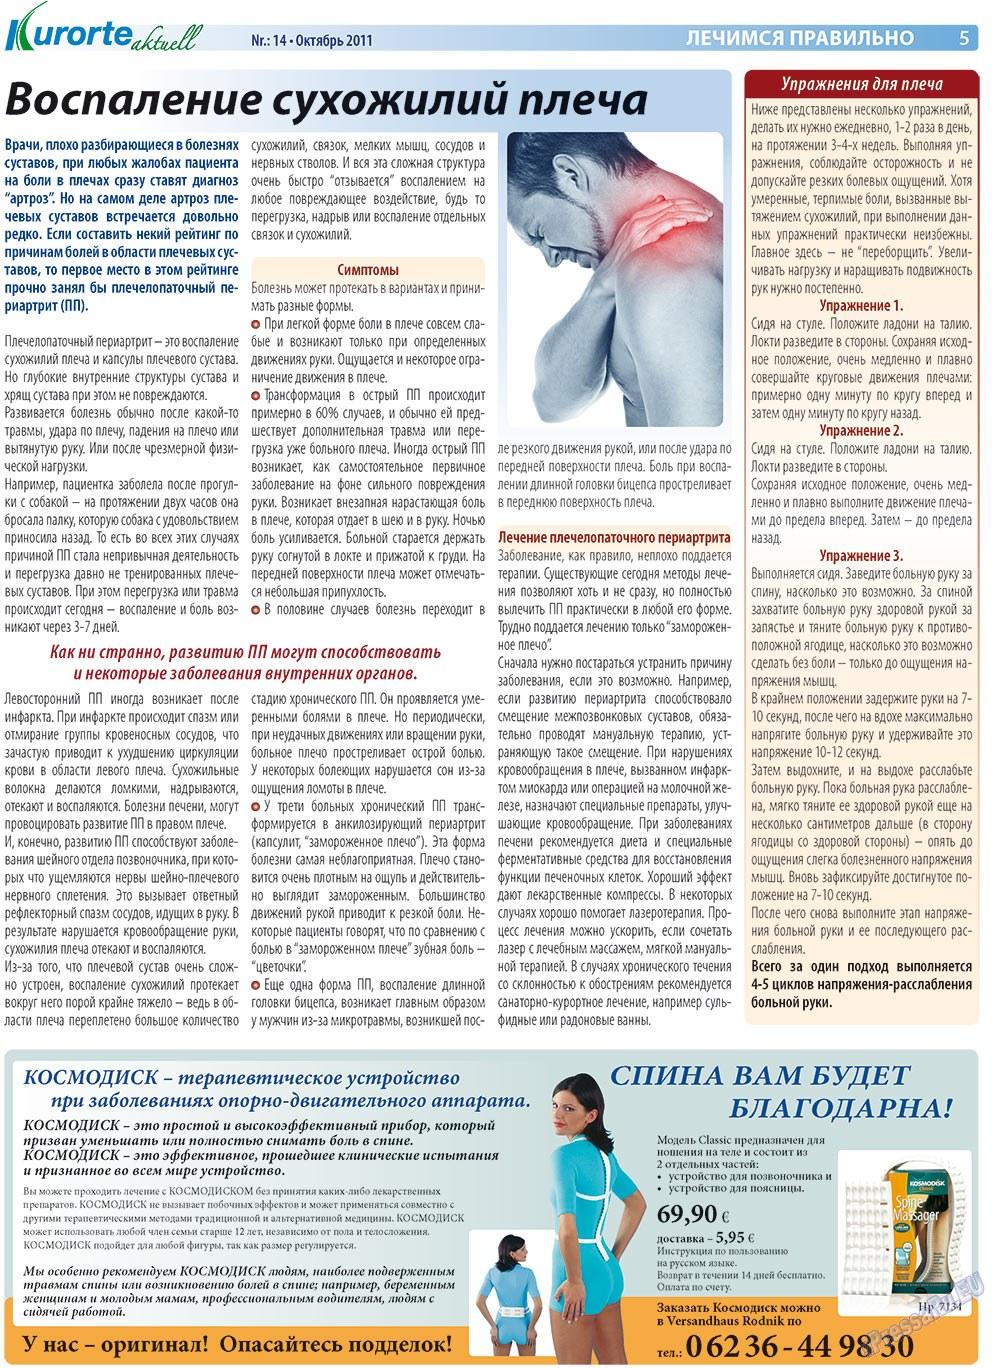 Kurorte aktuell (газета). 2011 год, номер 10, стр. 5